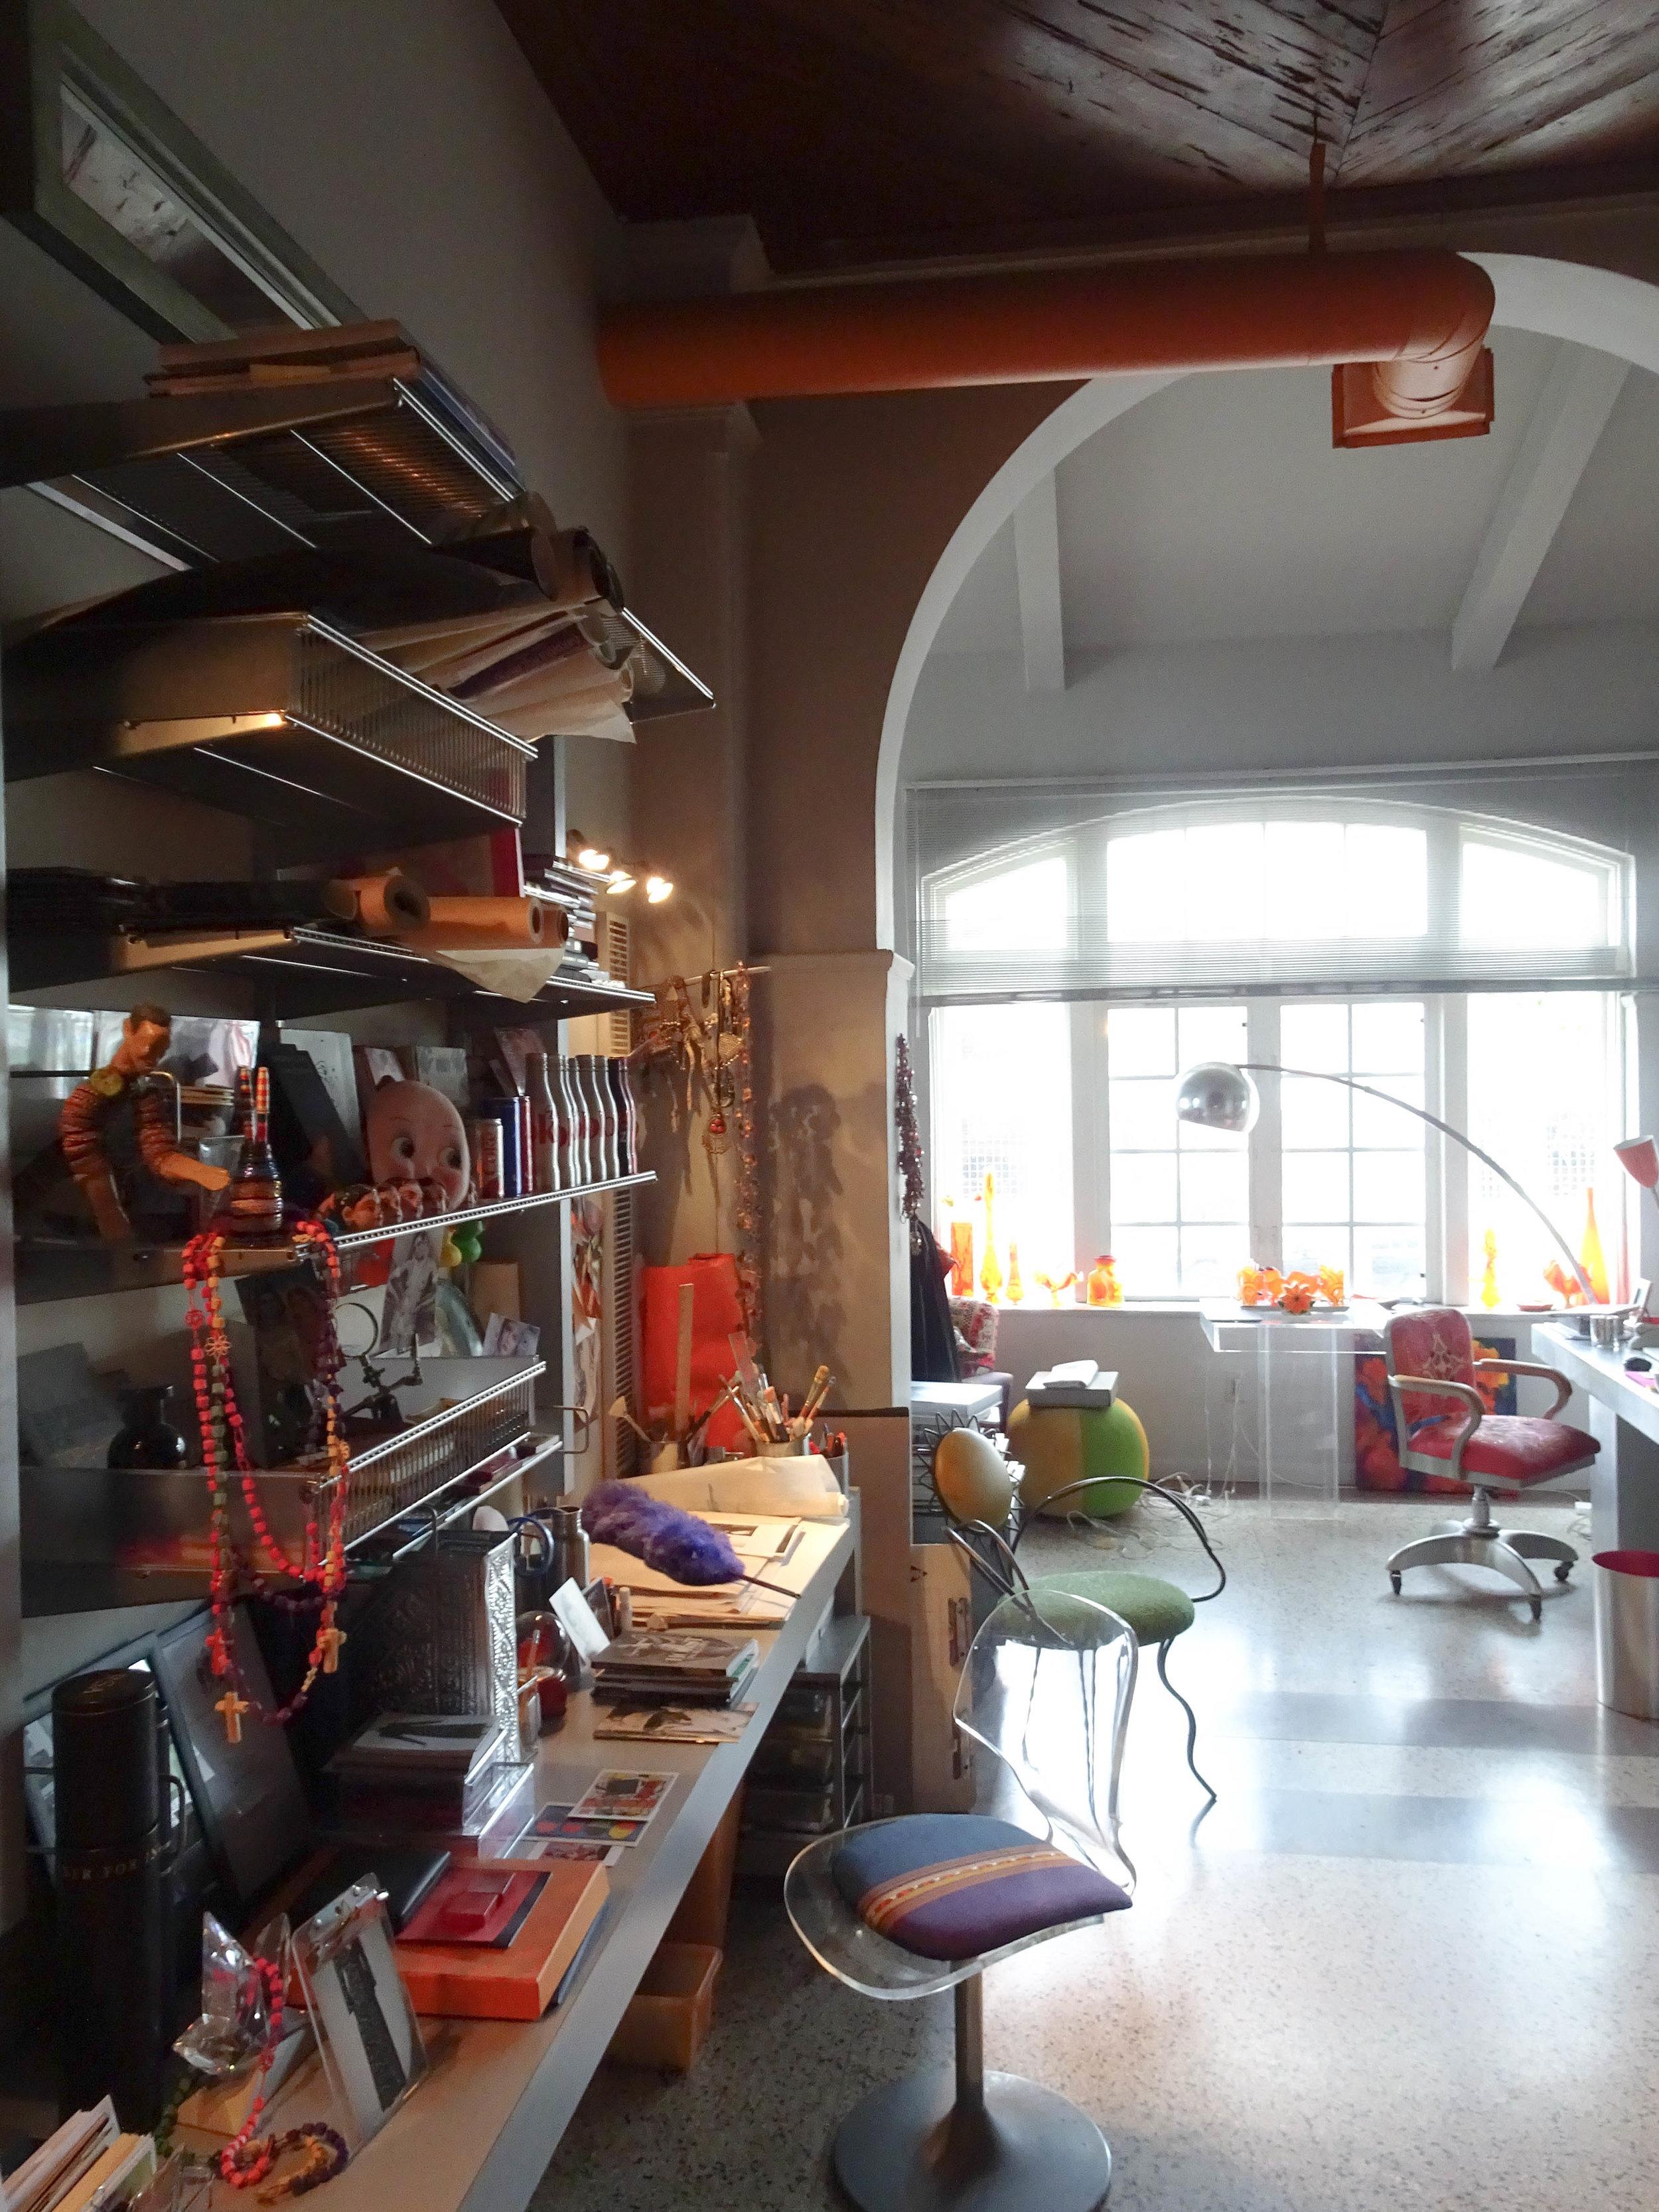 Barbara Hulanicki's home office in Miami, Florida.